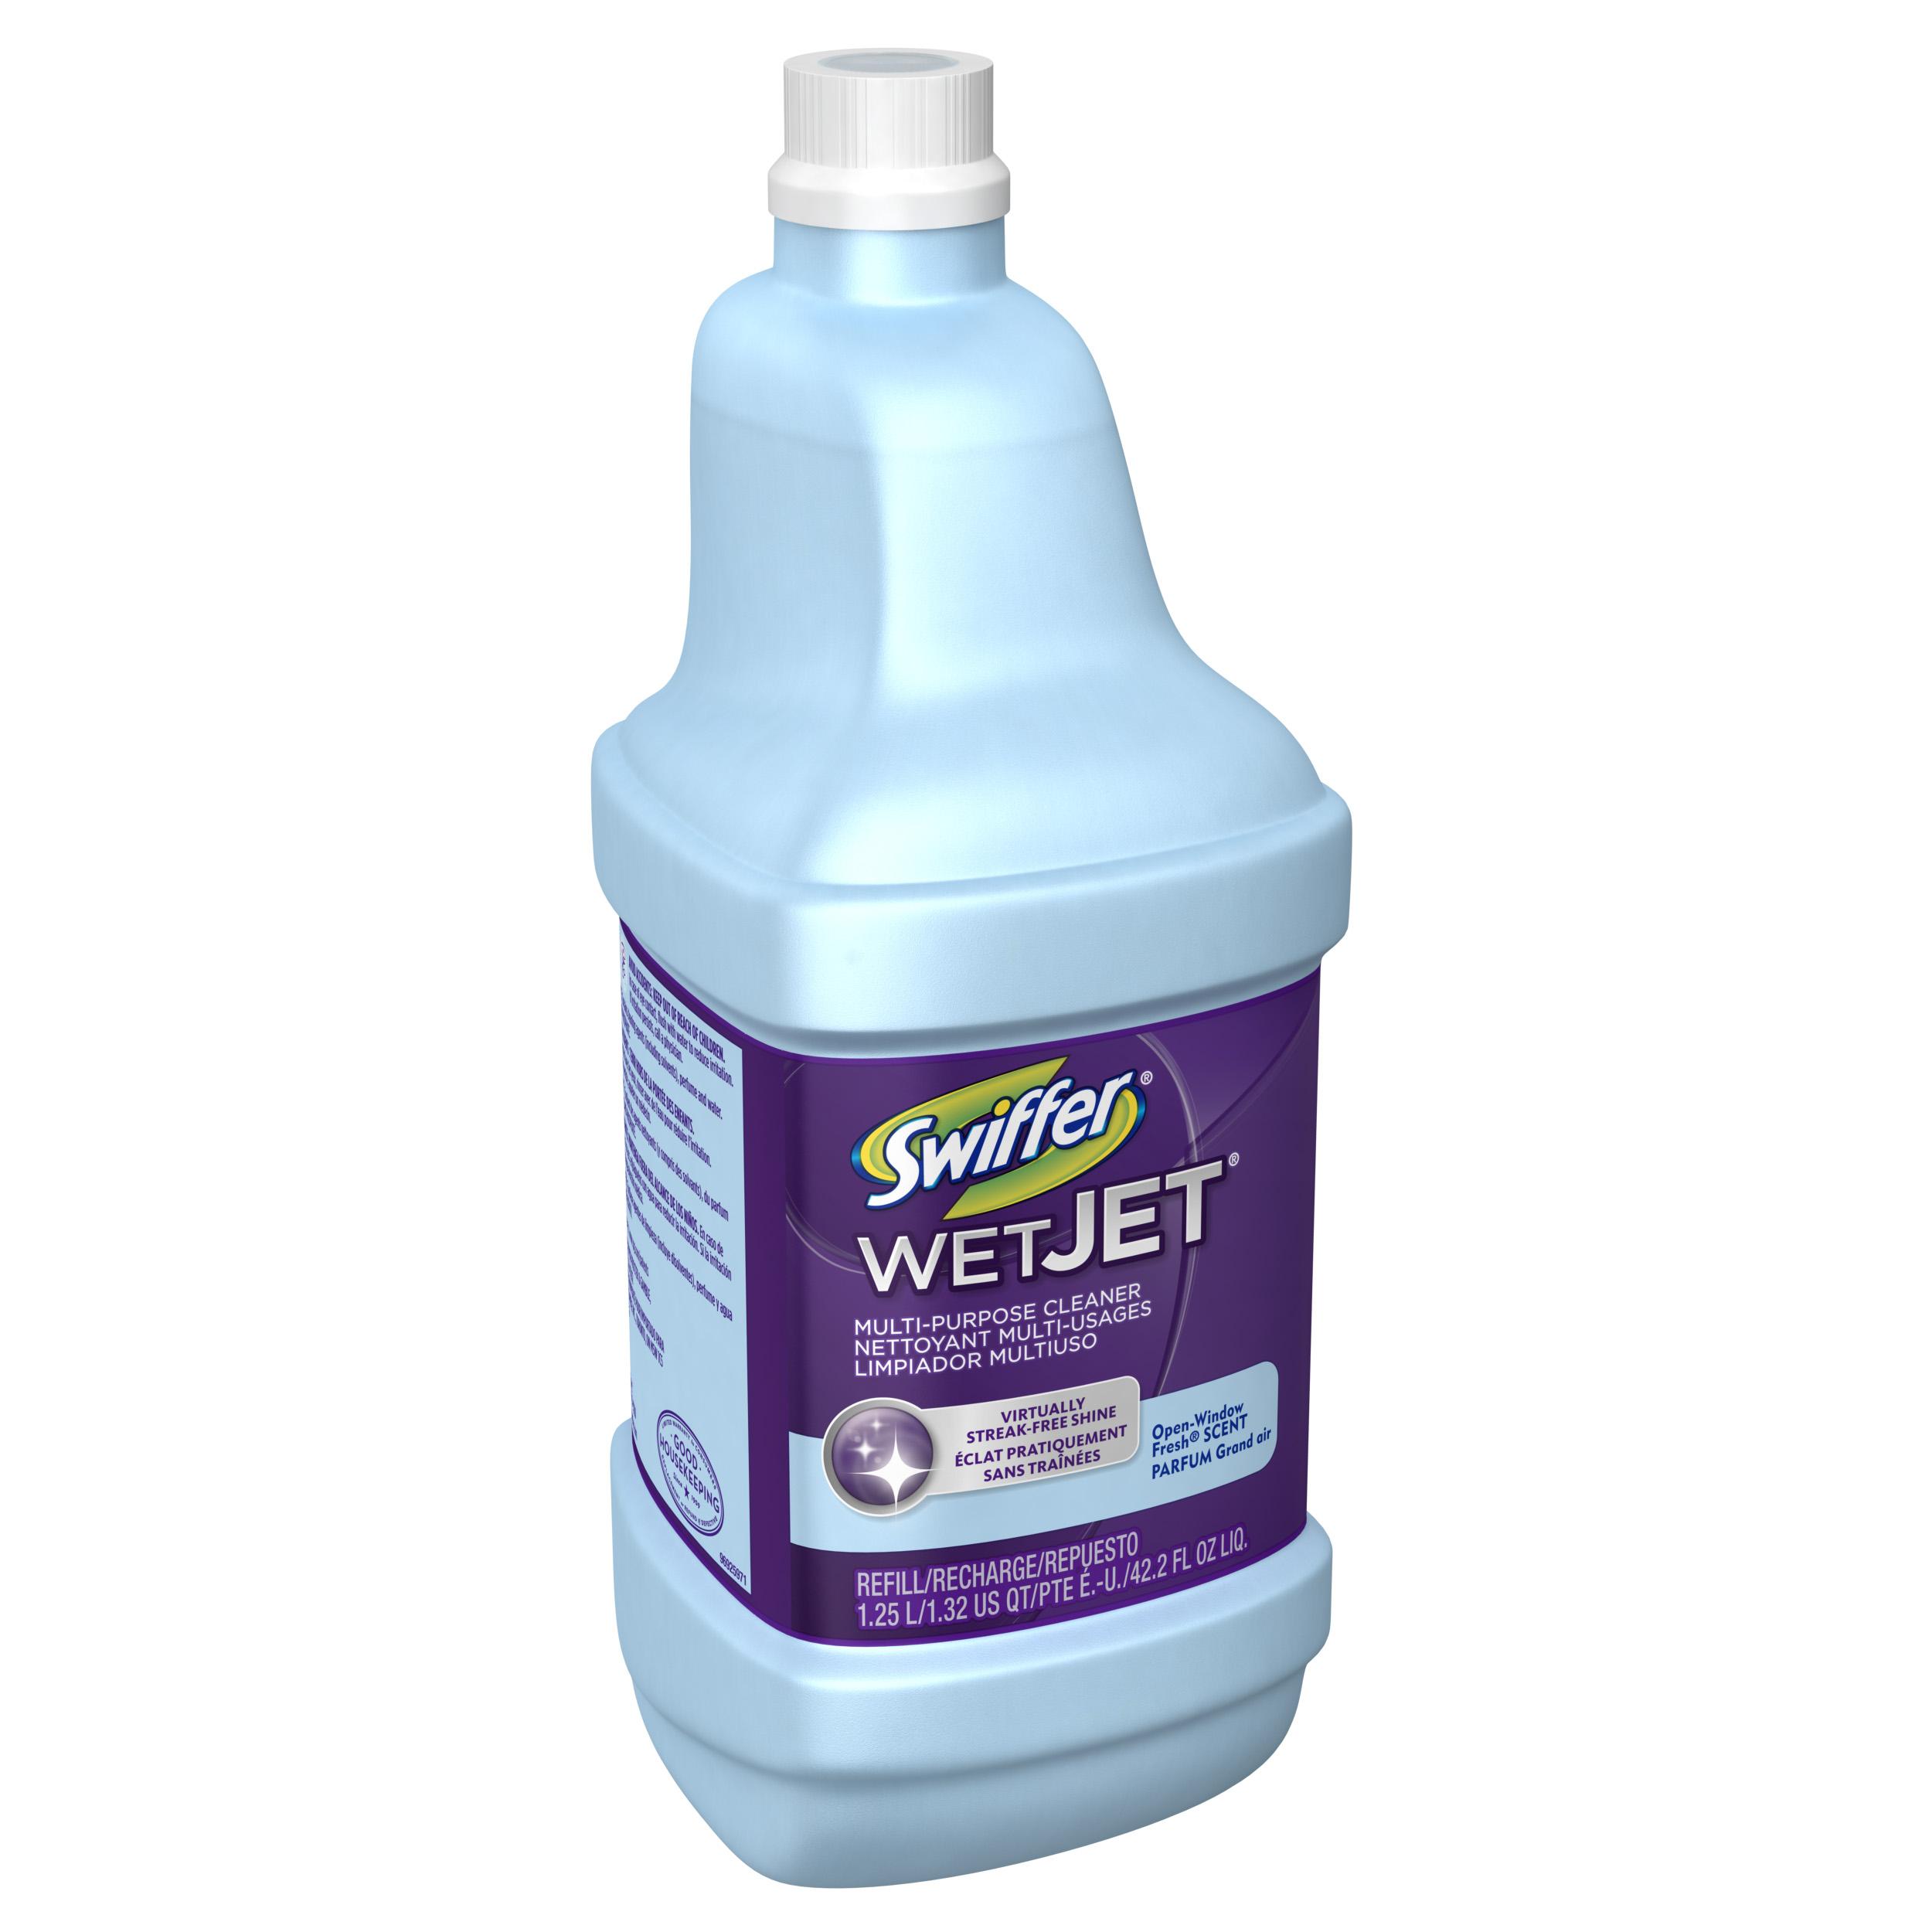 Home gt accessories gt bona pro series vinyl multipurpose cleaner - Swiffer Wetjet Multi Purpose Floor Cleaner Solution Refill Open Window Fresh Scent 1 25l